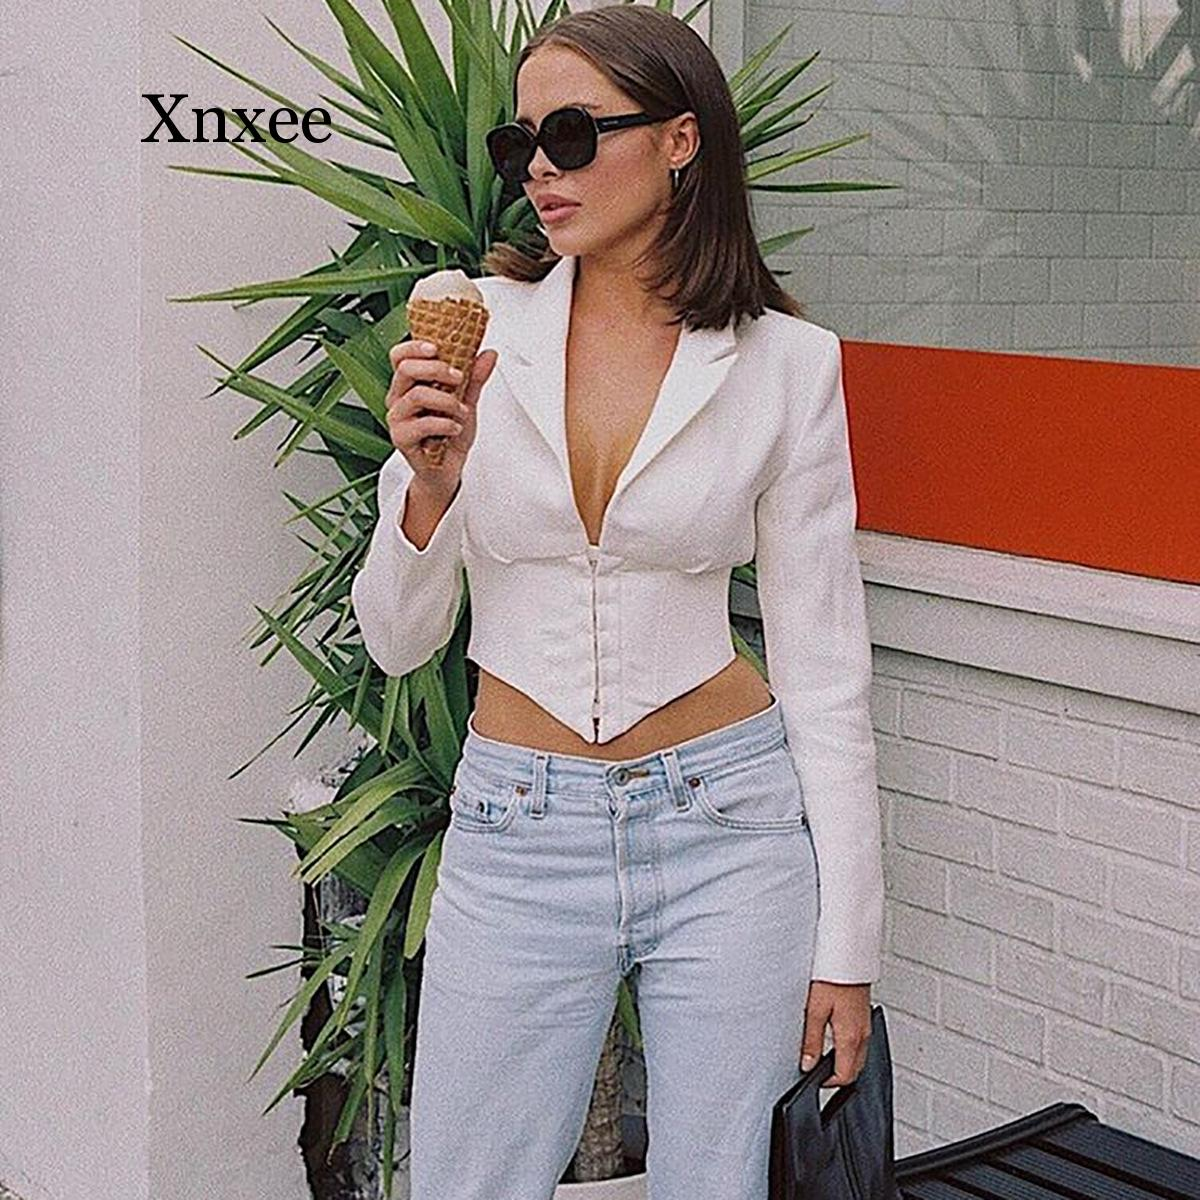 Deep V Long Sleeve White Blazer Women Sexy Office Wear Jacket Vintage Work Cardigan Coat Autumn white top Girdle Short top